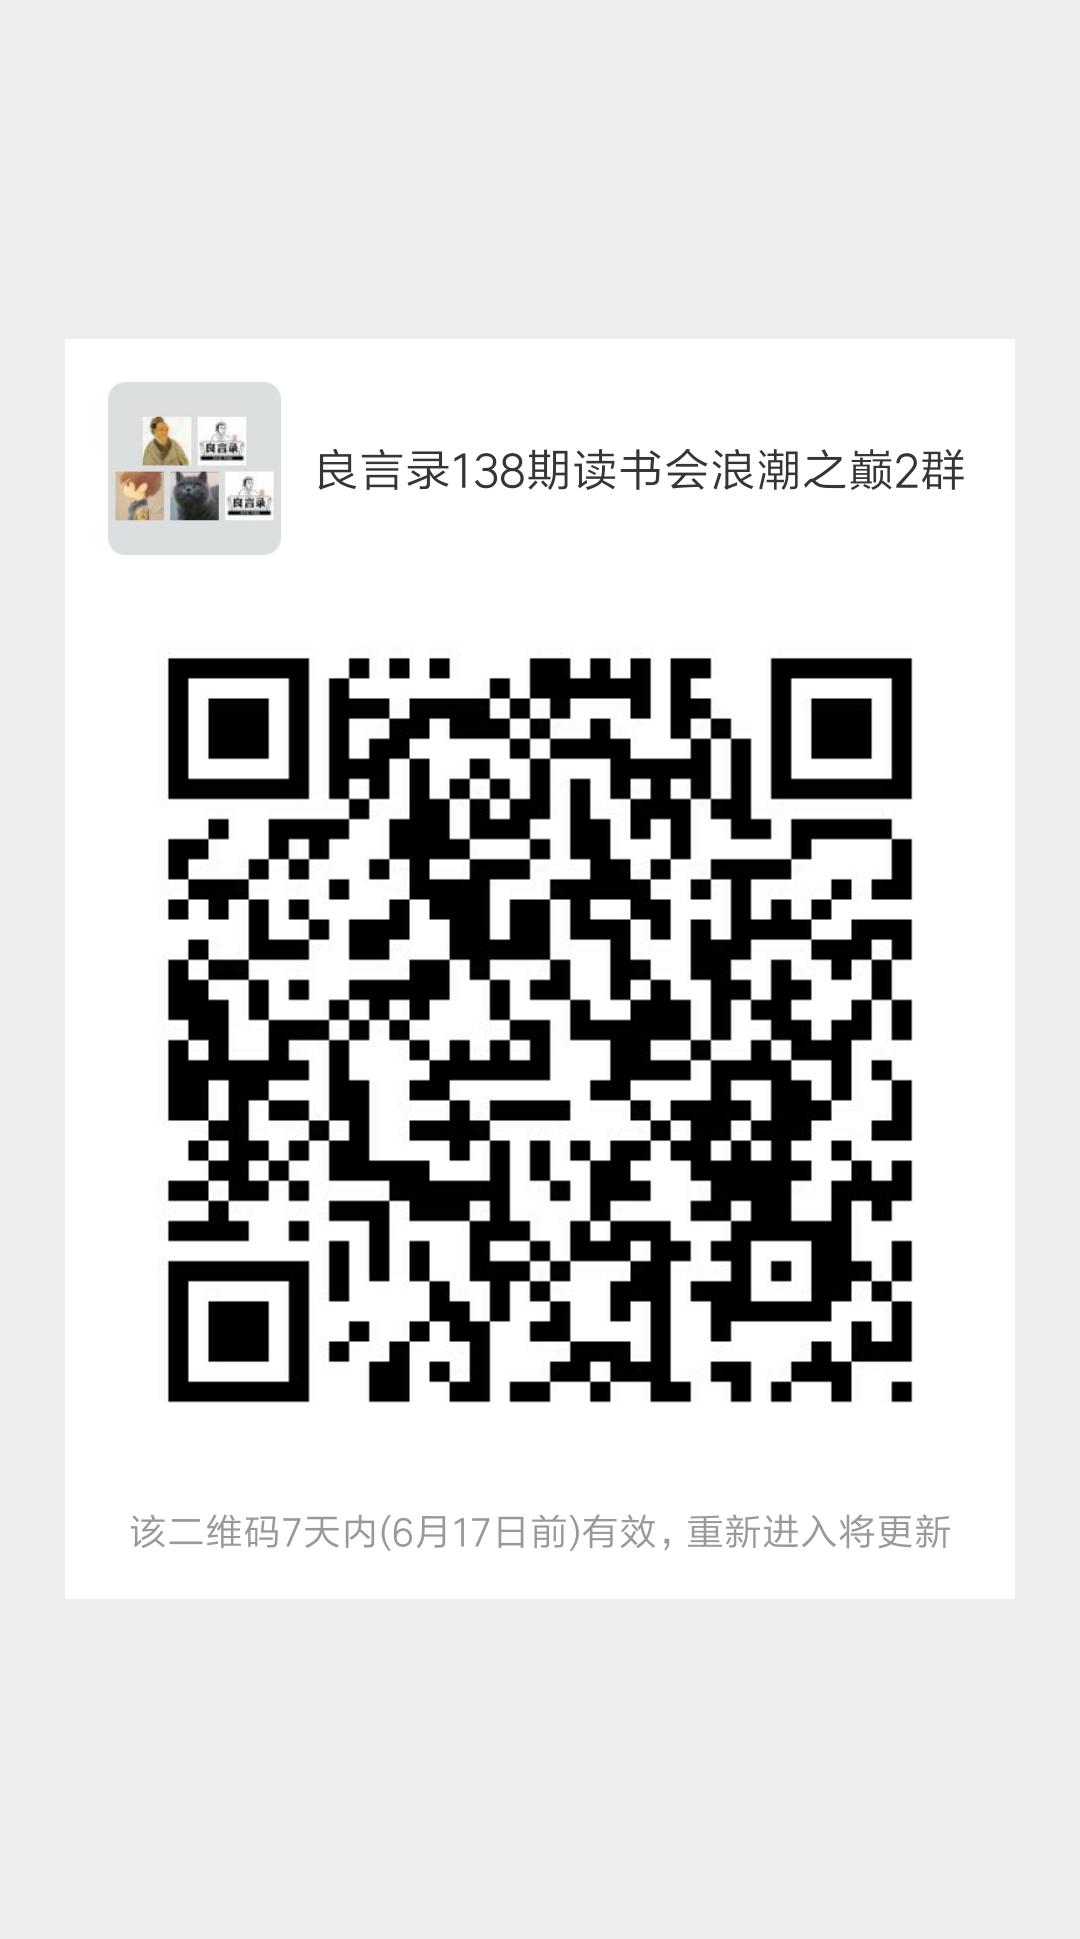 http://www.huodongxing.com/file/20151119/5622148470499/233447430856313.png